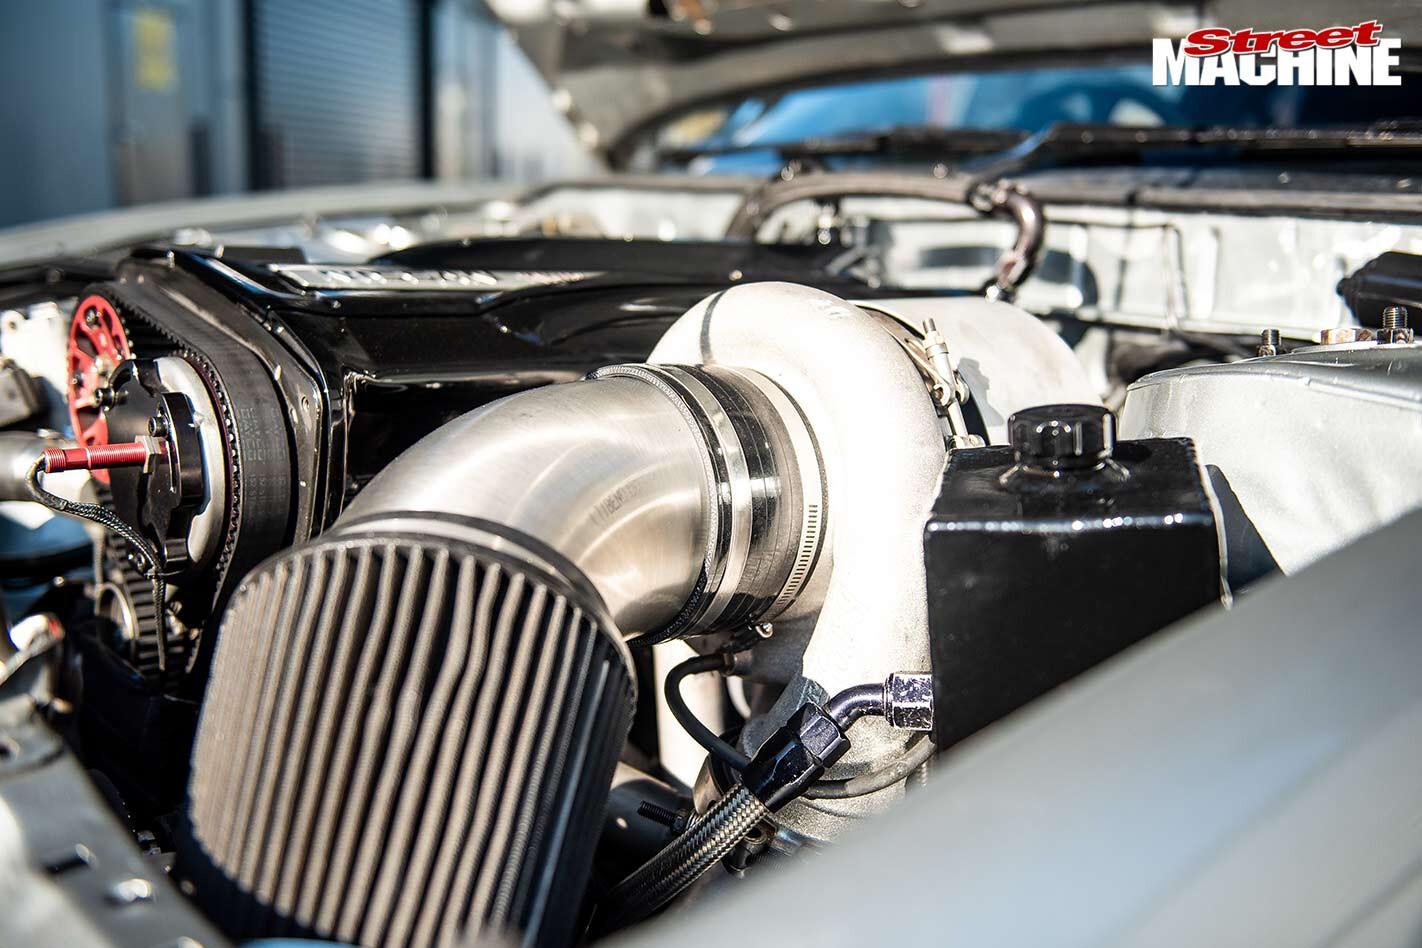 NIssan Silvia engine bay